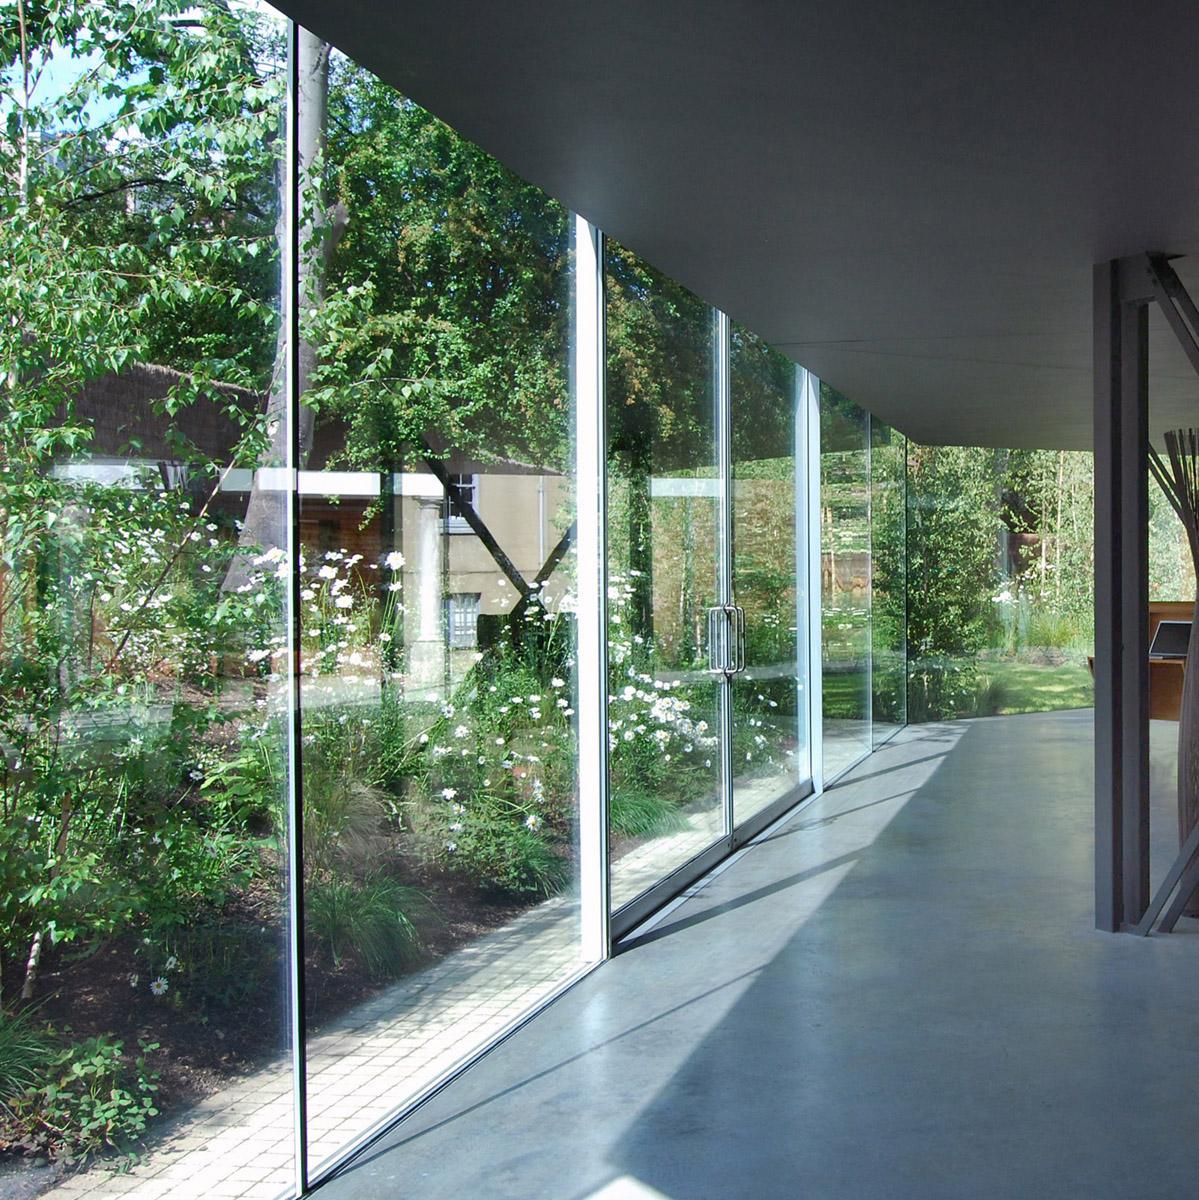 Birchwood-House-01-square